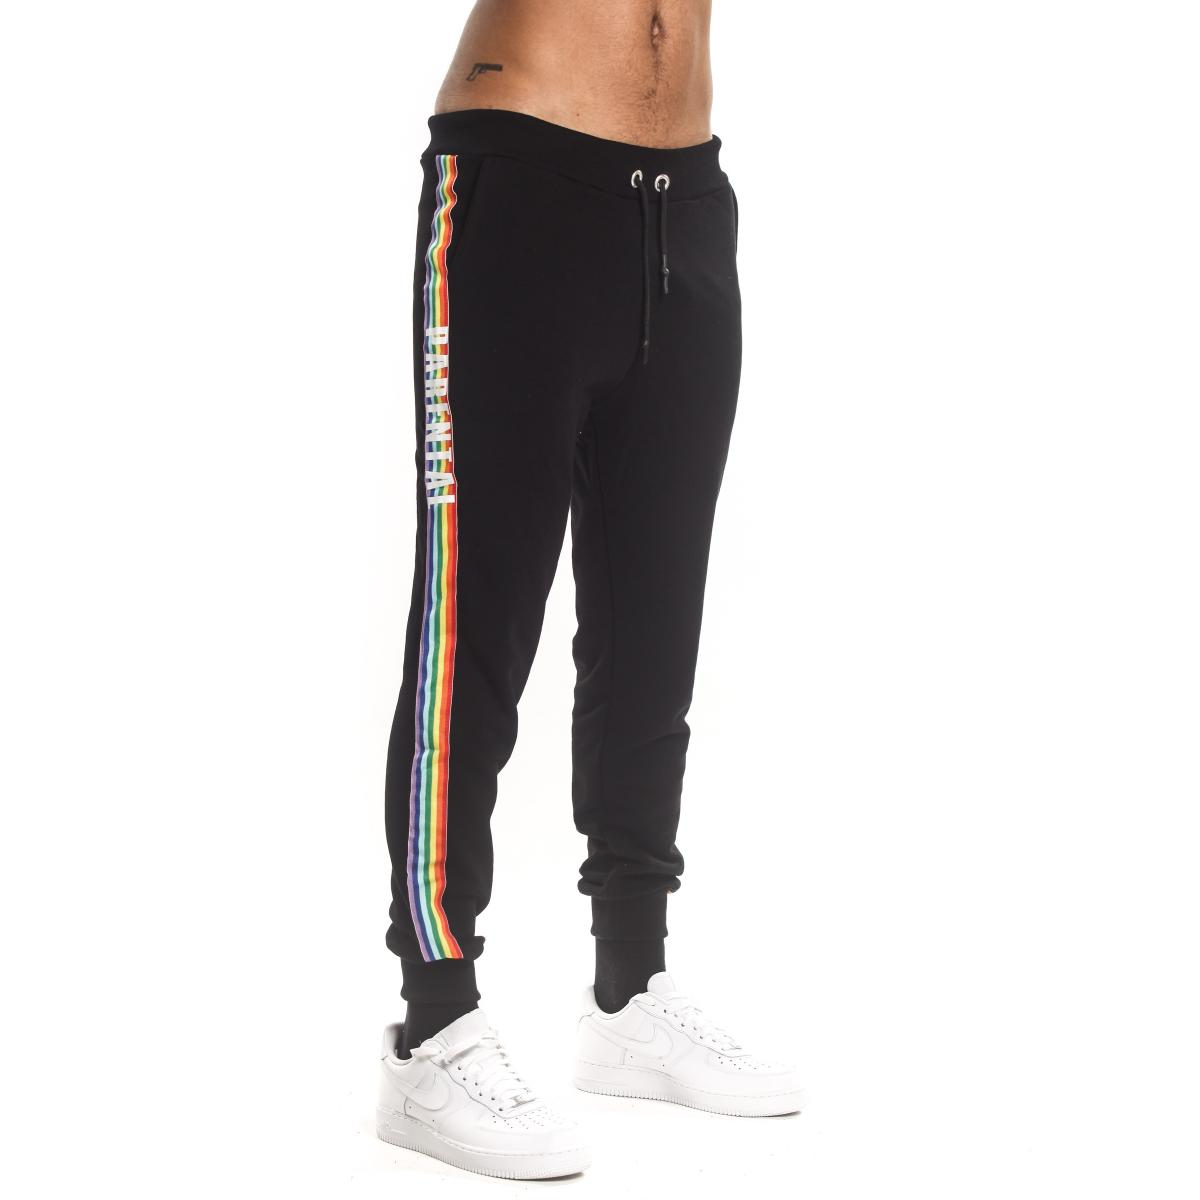 Pantalone tuta Parental Advisory con bande laterali ed elestici al fondo da uomo rif. AD965U